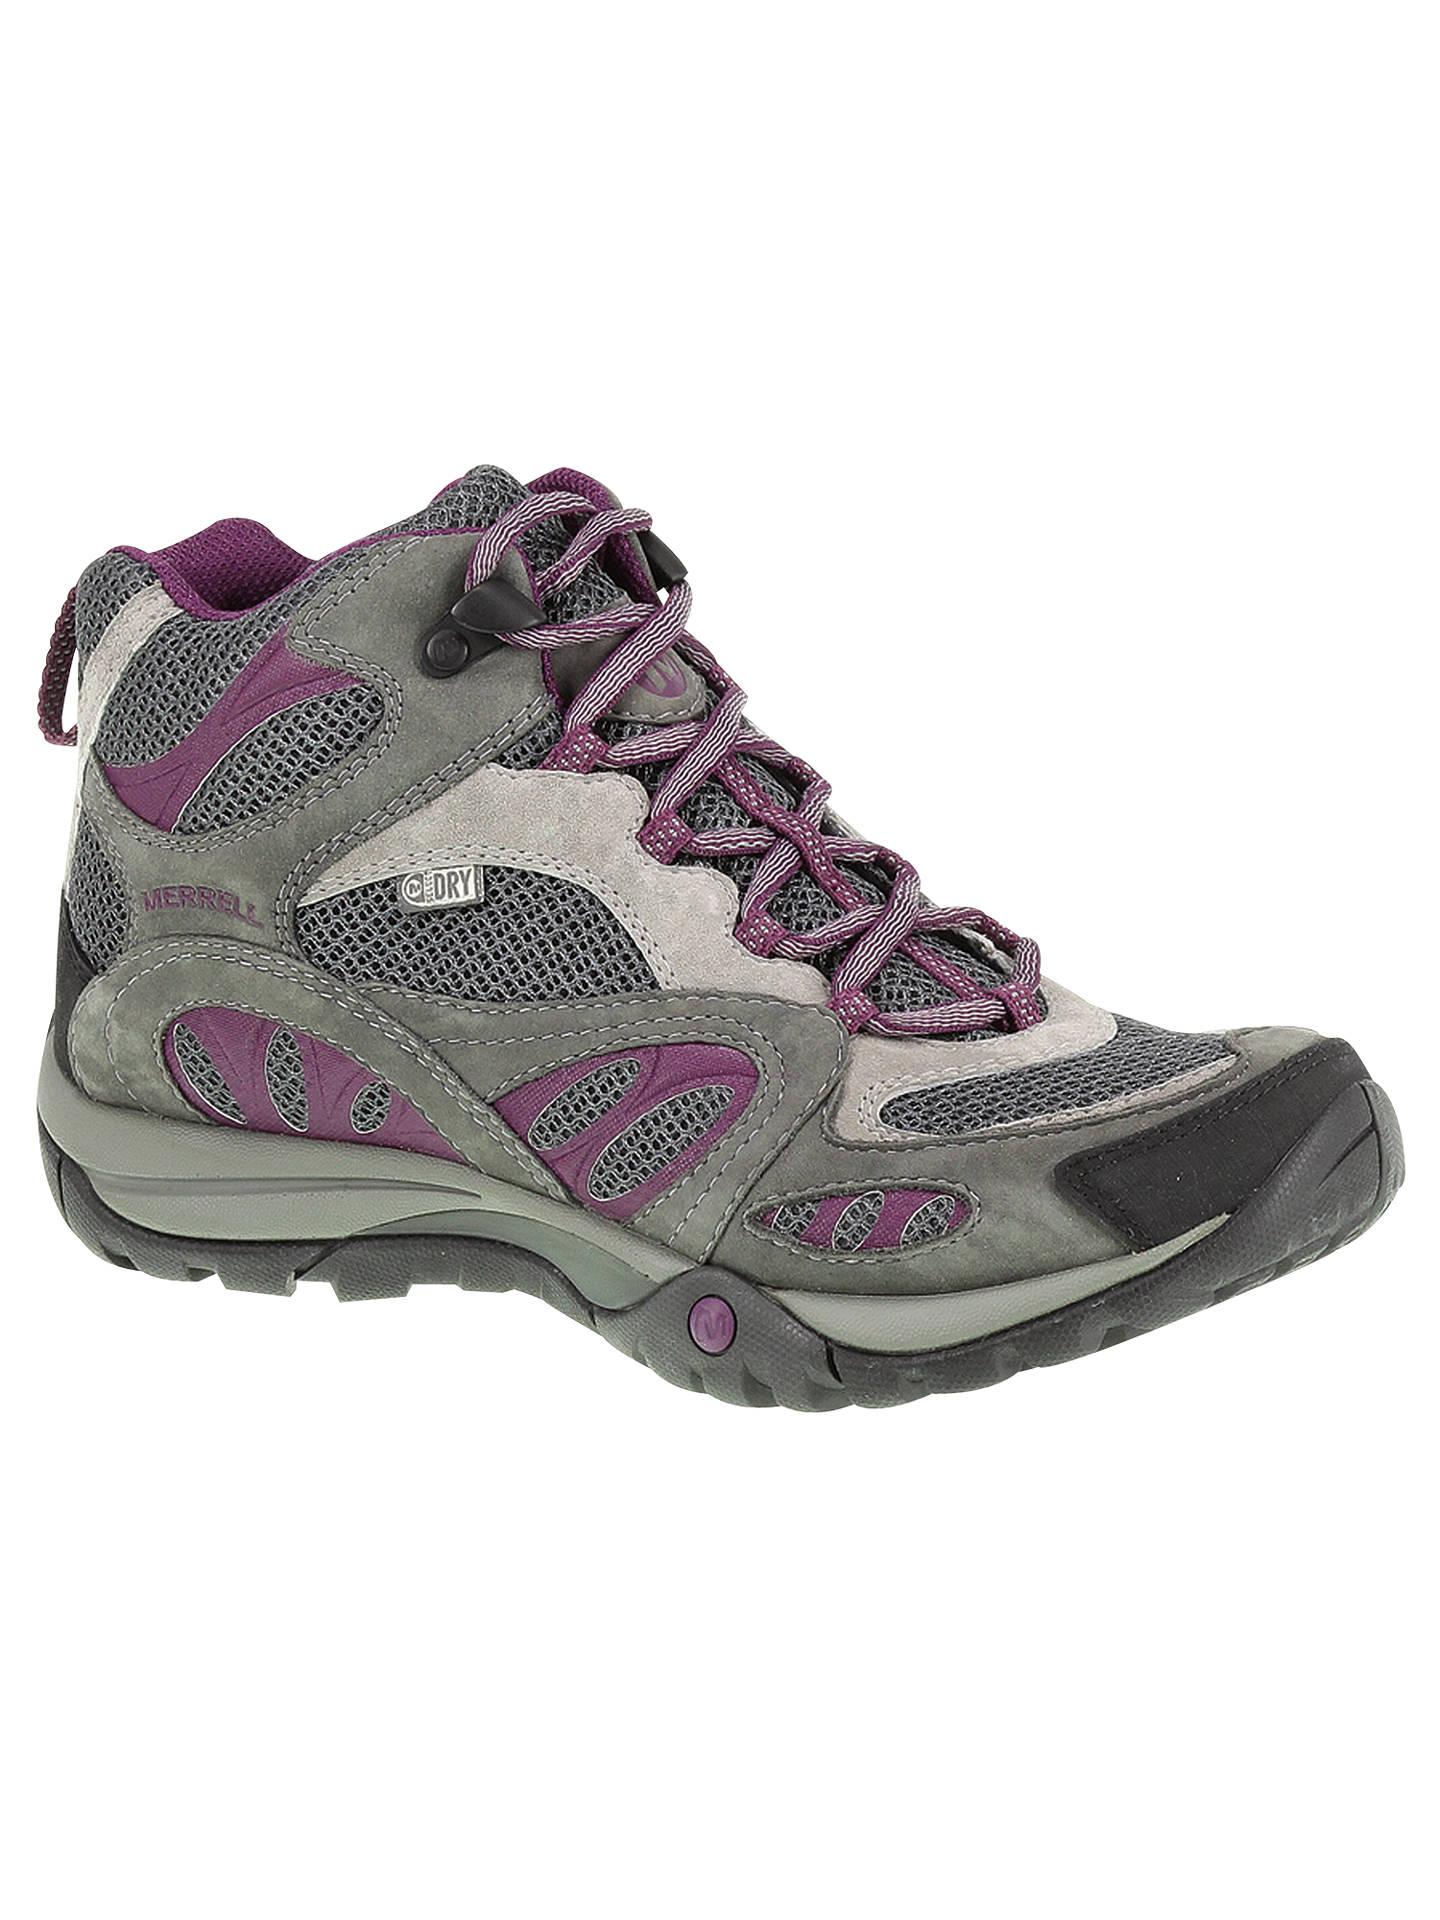 faf9649cc Merrell Azura Mid Waterproof Women s Hiking Shoes at John Lewis ...